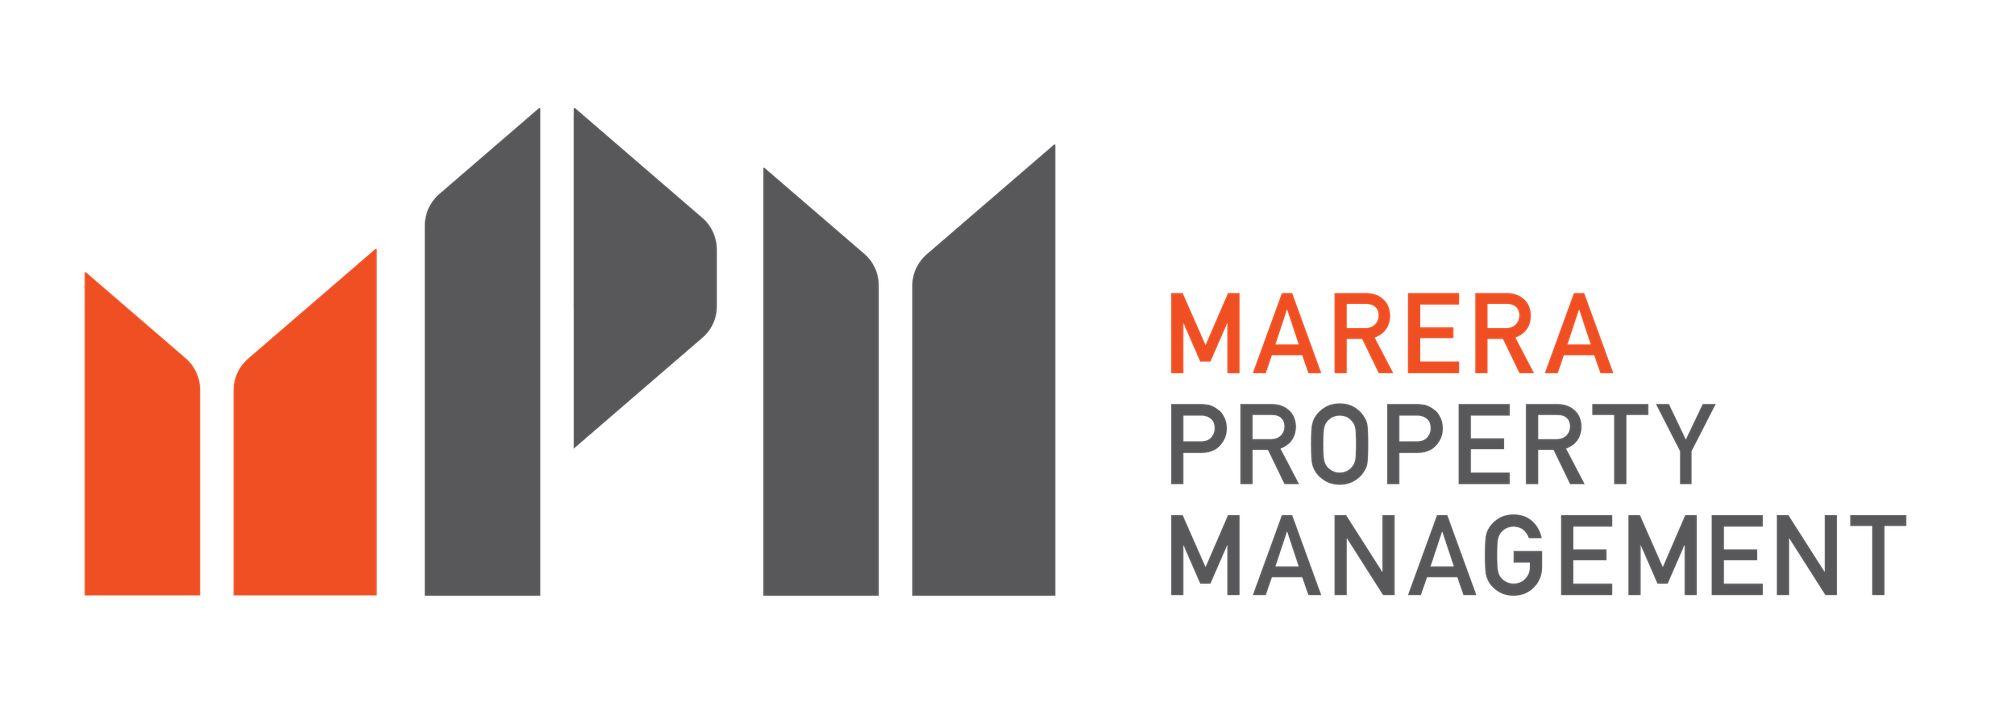 Marera Property Management doo